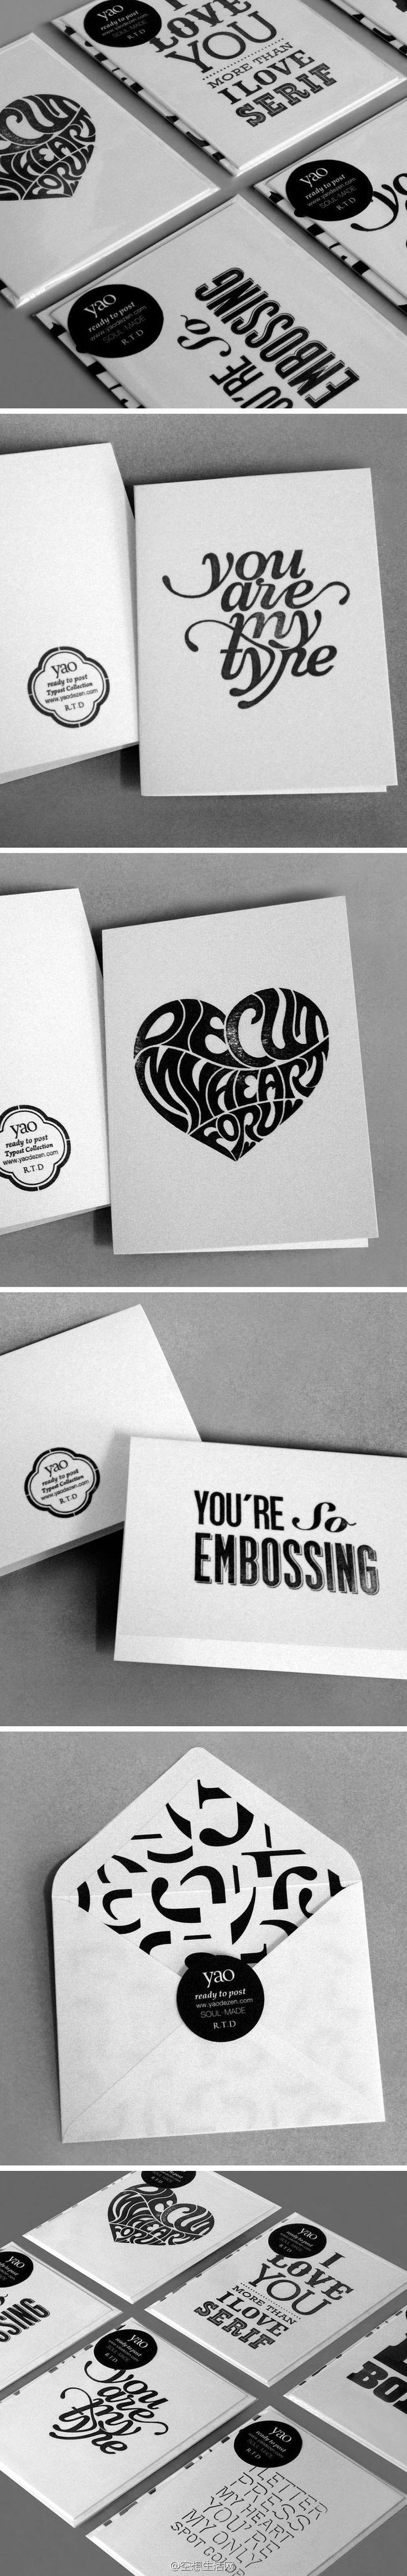 type valentines (har har) I love this...#layout #design #typography